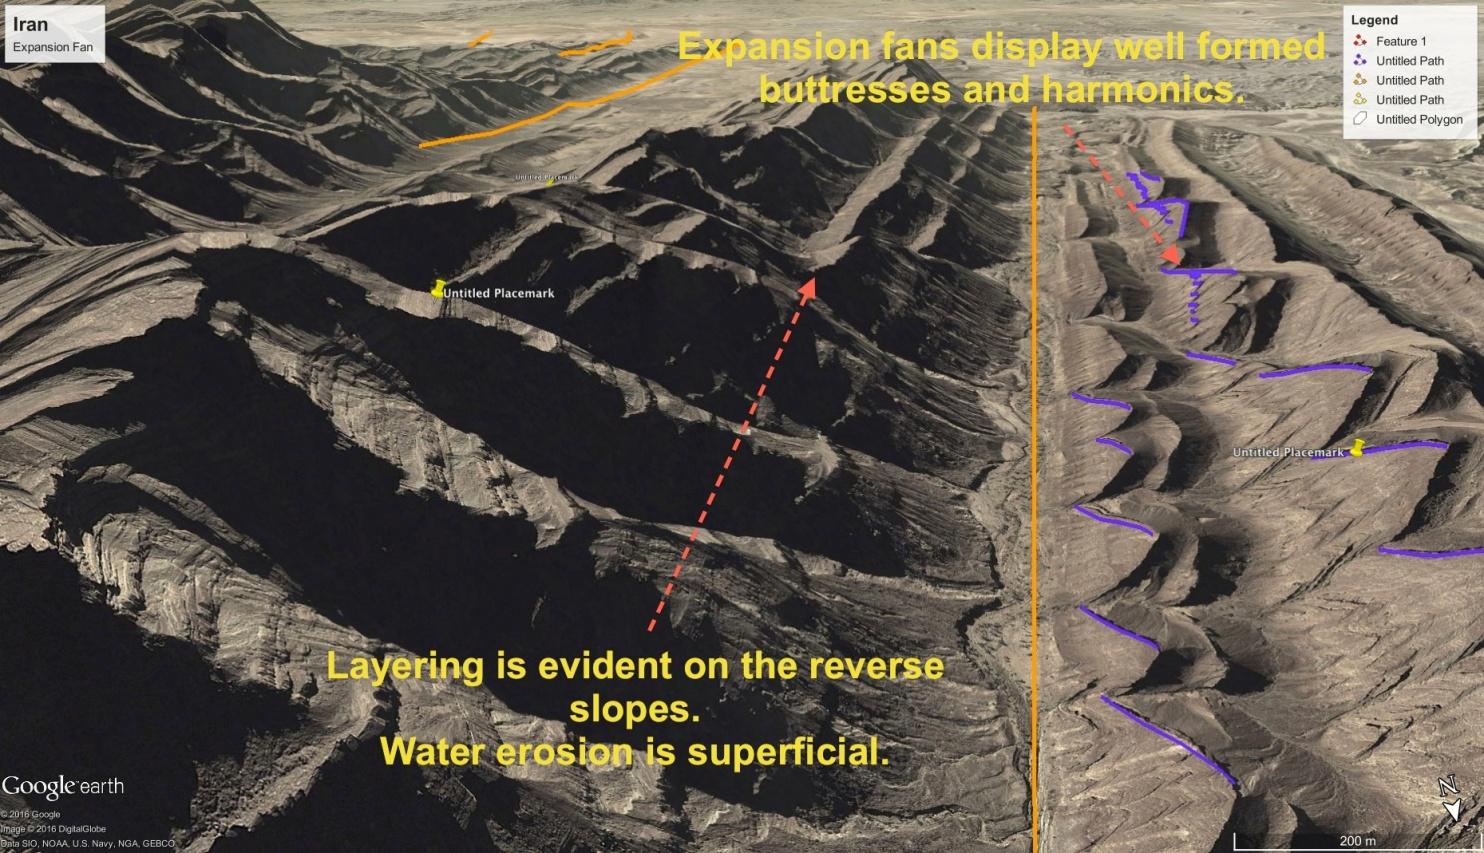 Arc Blast: Electric Carving of Planet Earth Aexpfaniran6